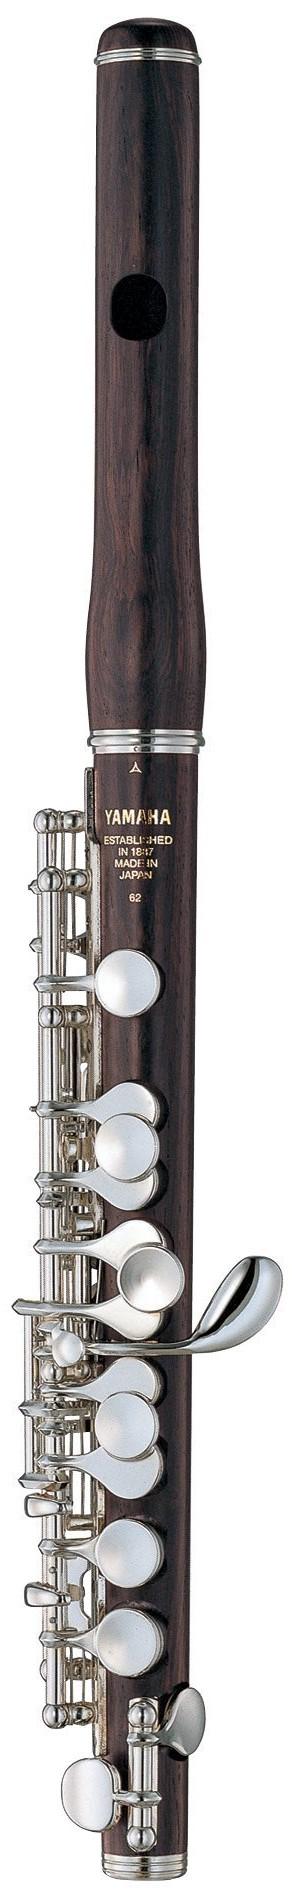 Yamaha - YPC - 62 - HK-G - Holzblasinstrumente - Piccolo-Flöten | MUSIK BERTRAM Deutschland Freiburg